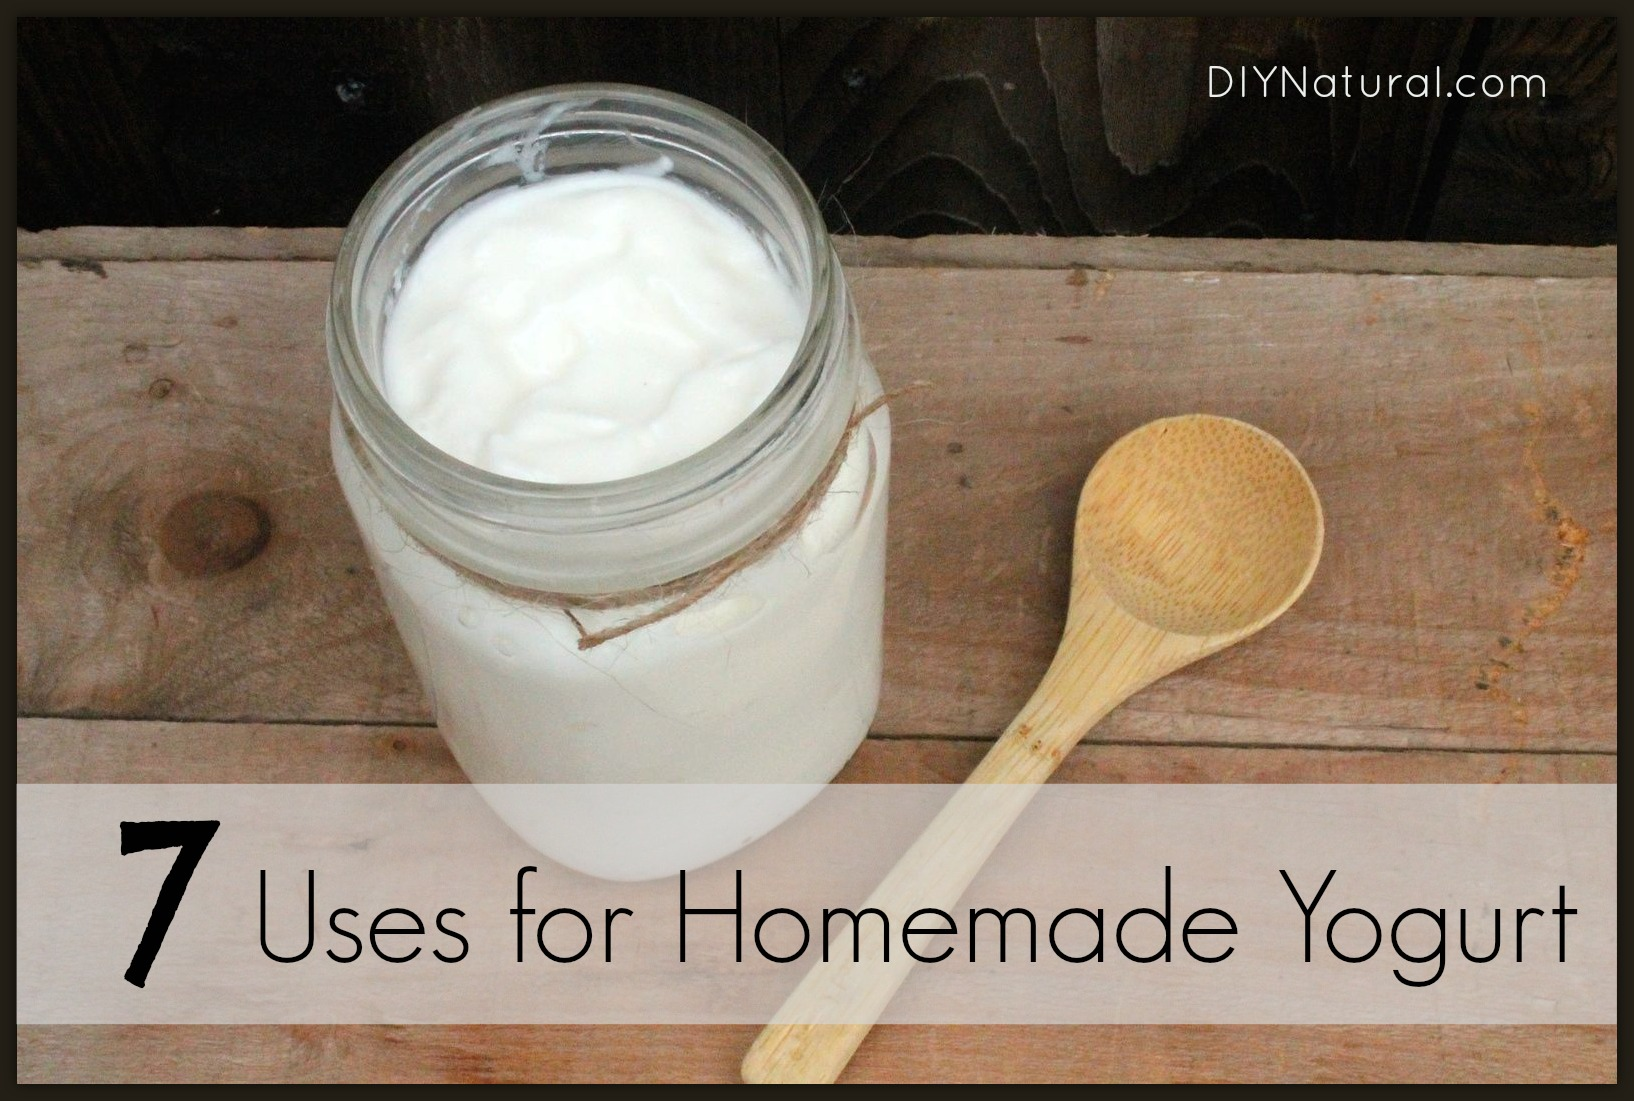 Delicious Ways To Use Homemade Yogurt